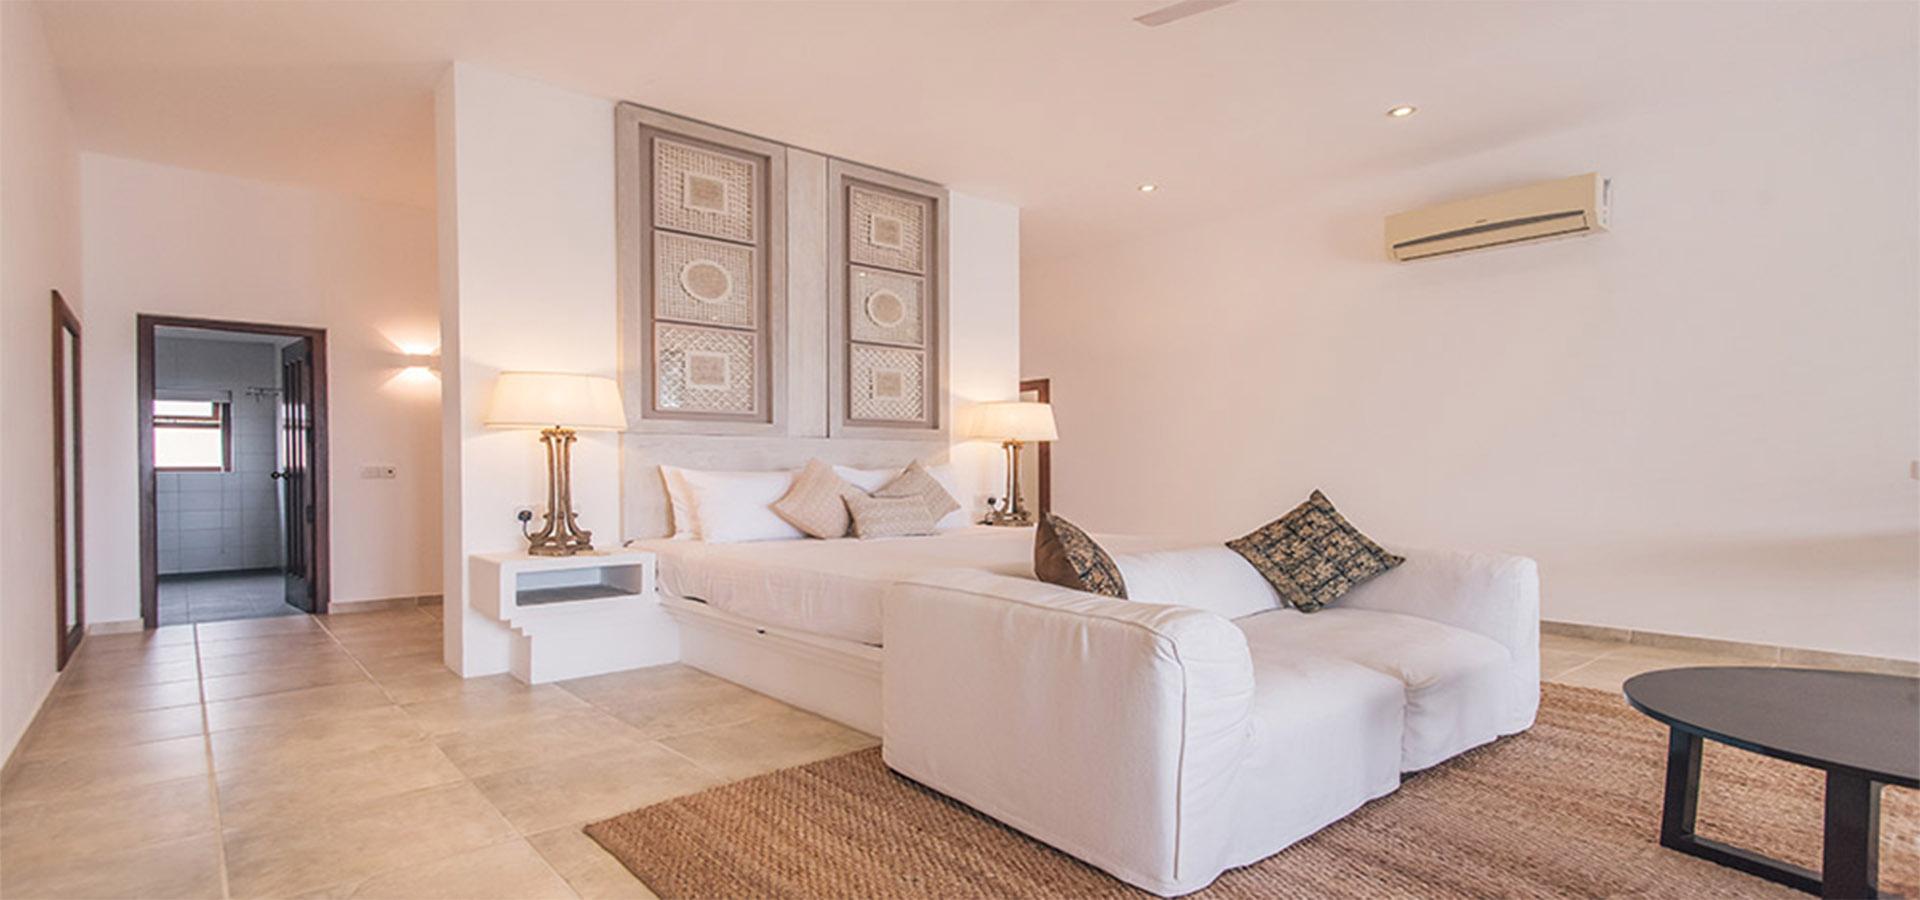 Serendipity_Hotels_luxury double room at villa thuya